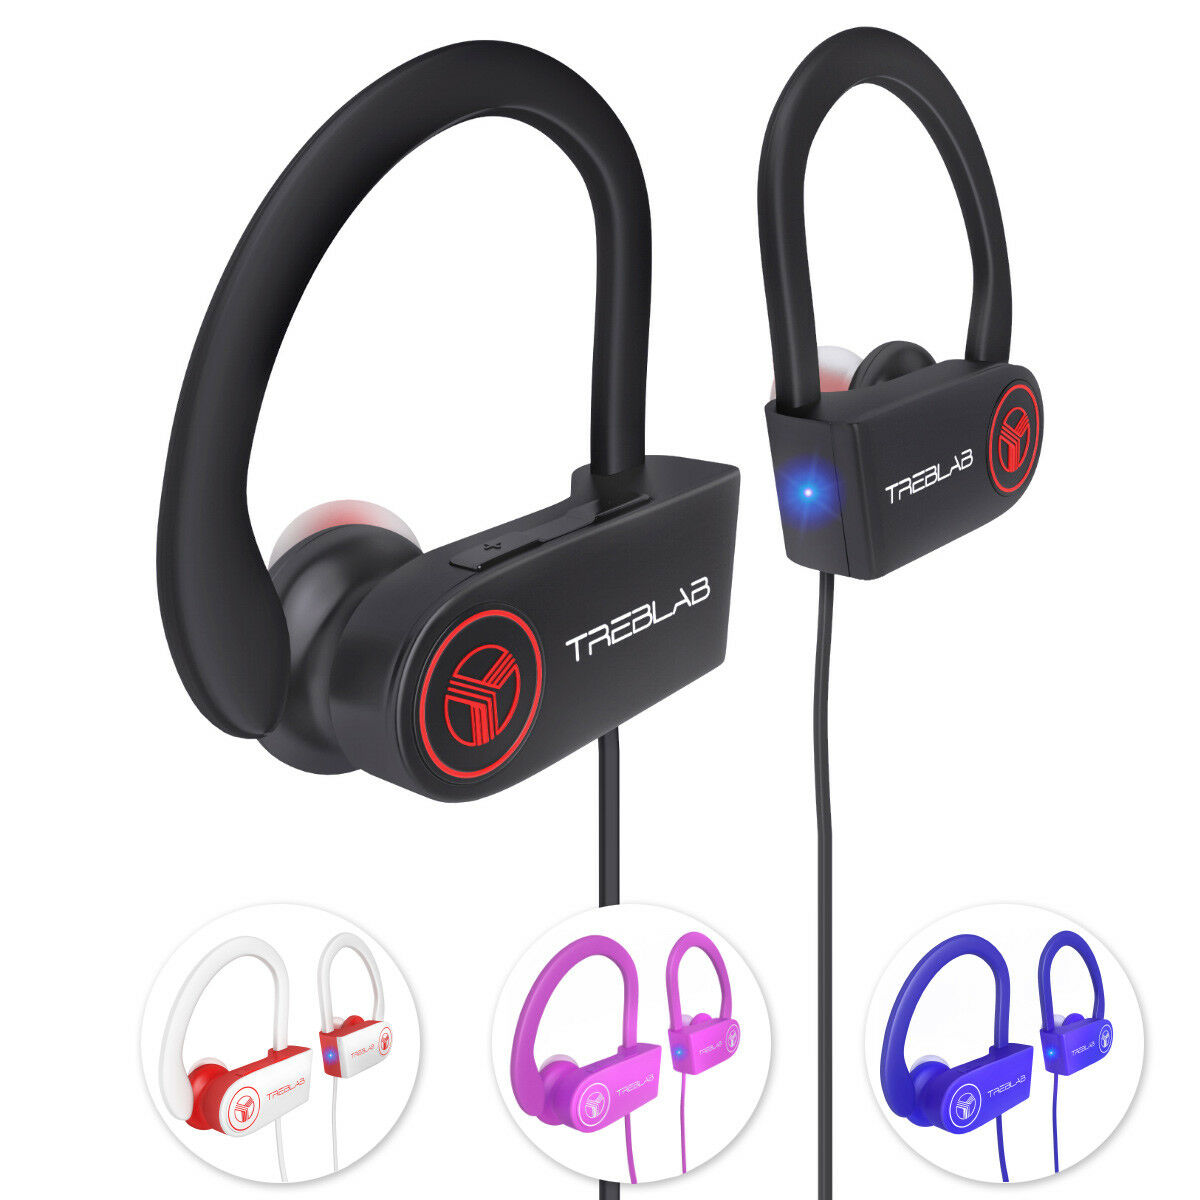 Headphones - TREBLAB XR100 Bluetooth Headphones Best Running Sports Workout Wireless Earbuds